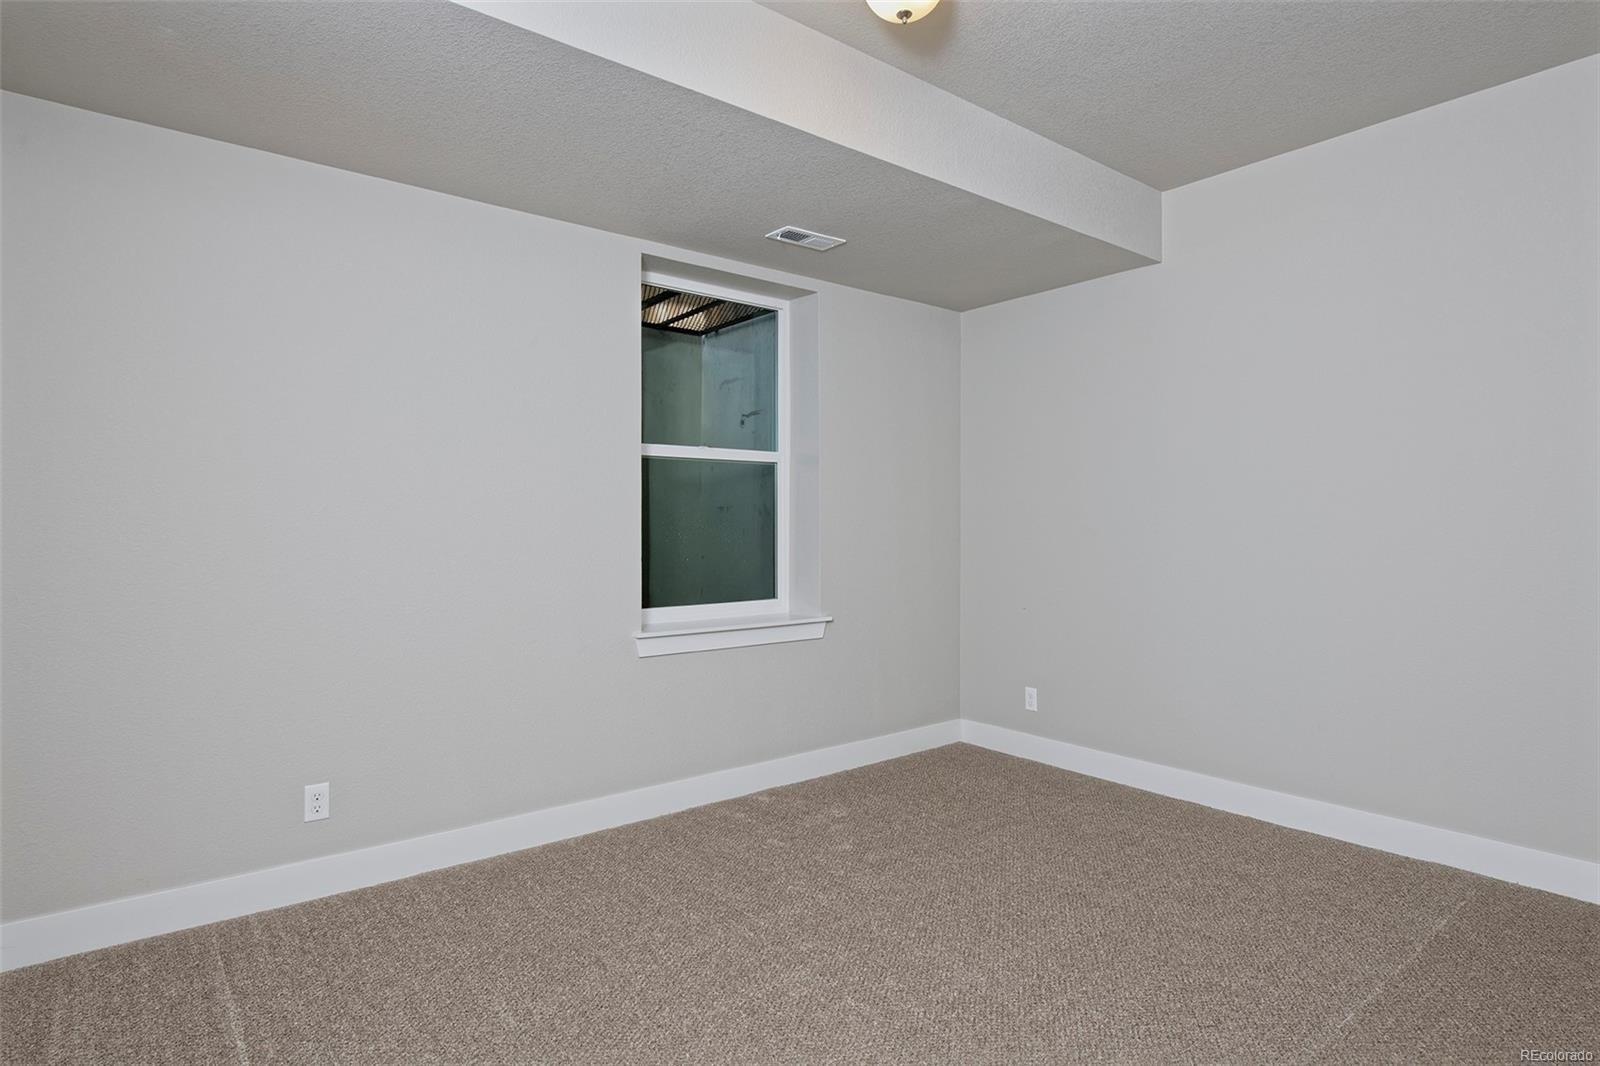 MLS# 7253288 - 32 - 10299 E 57th Avenue, Denver, CO 80238